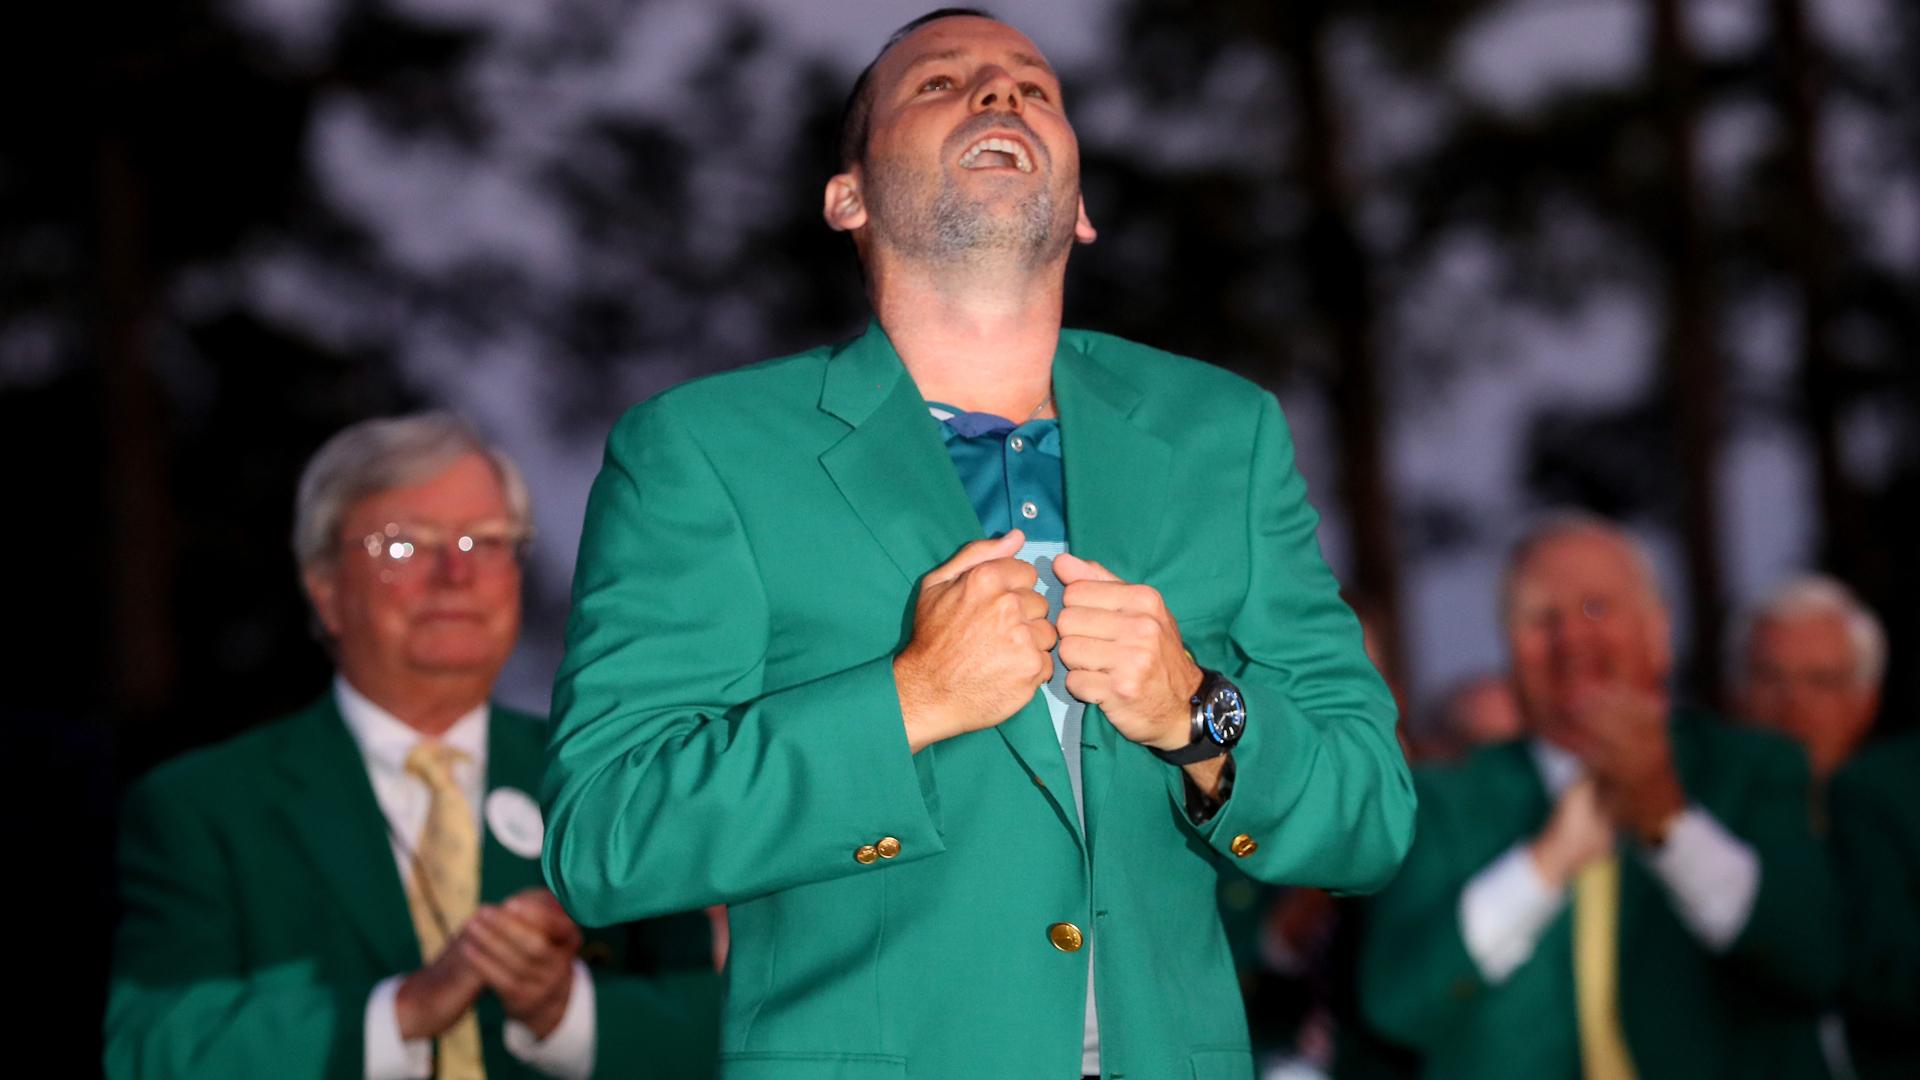 Garcia, Rose eye green jackets as Masters drama unfolds